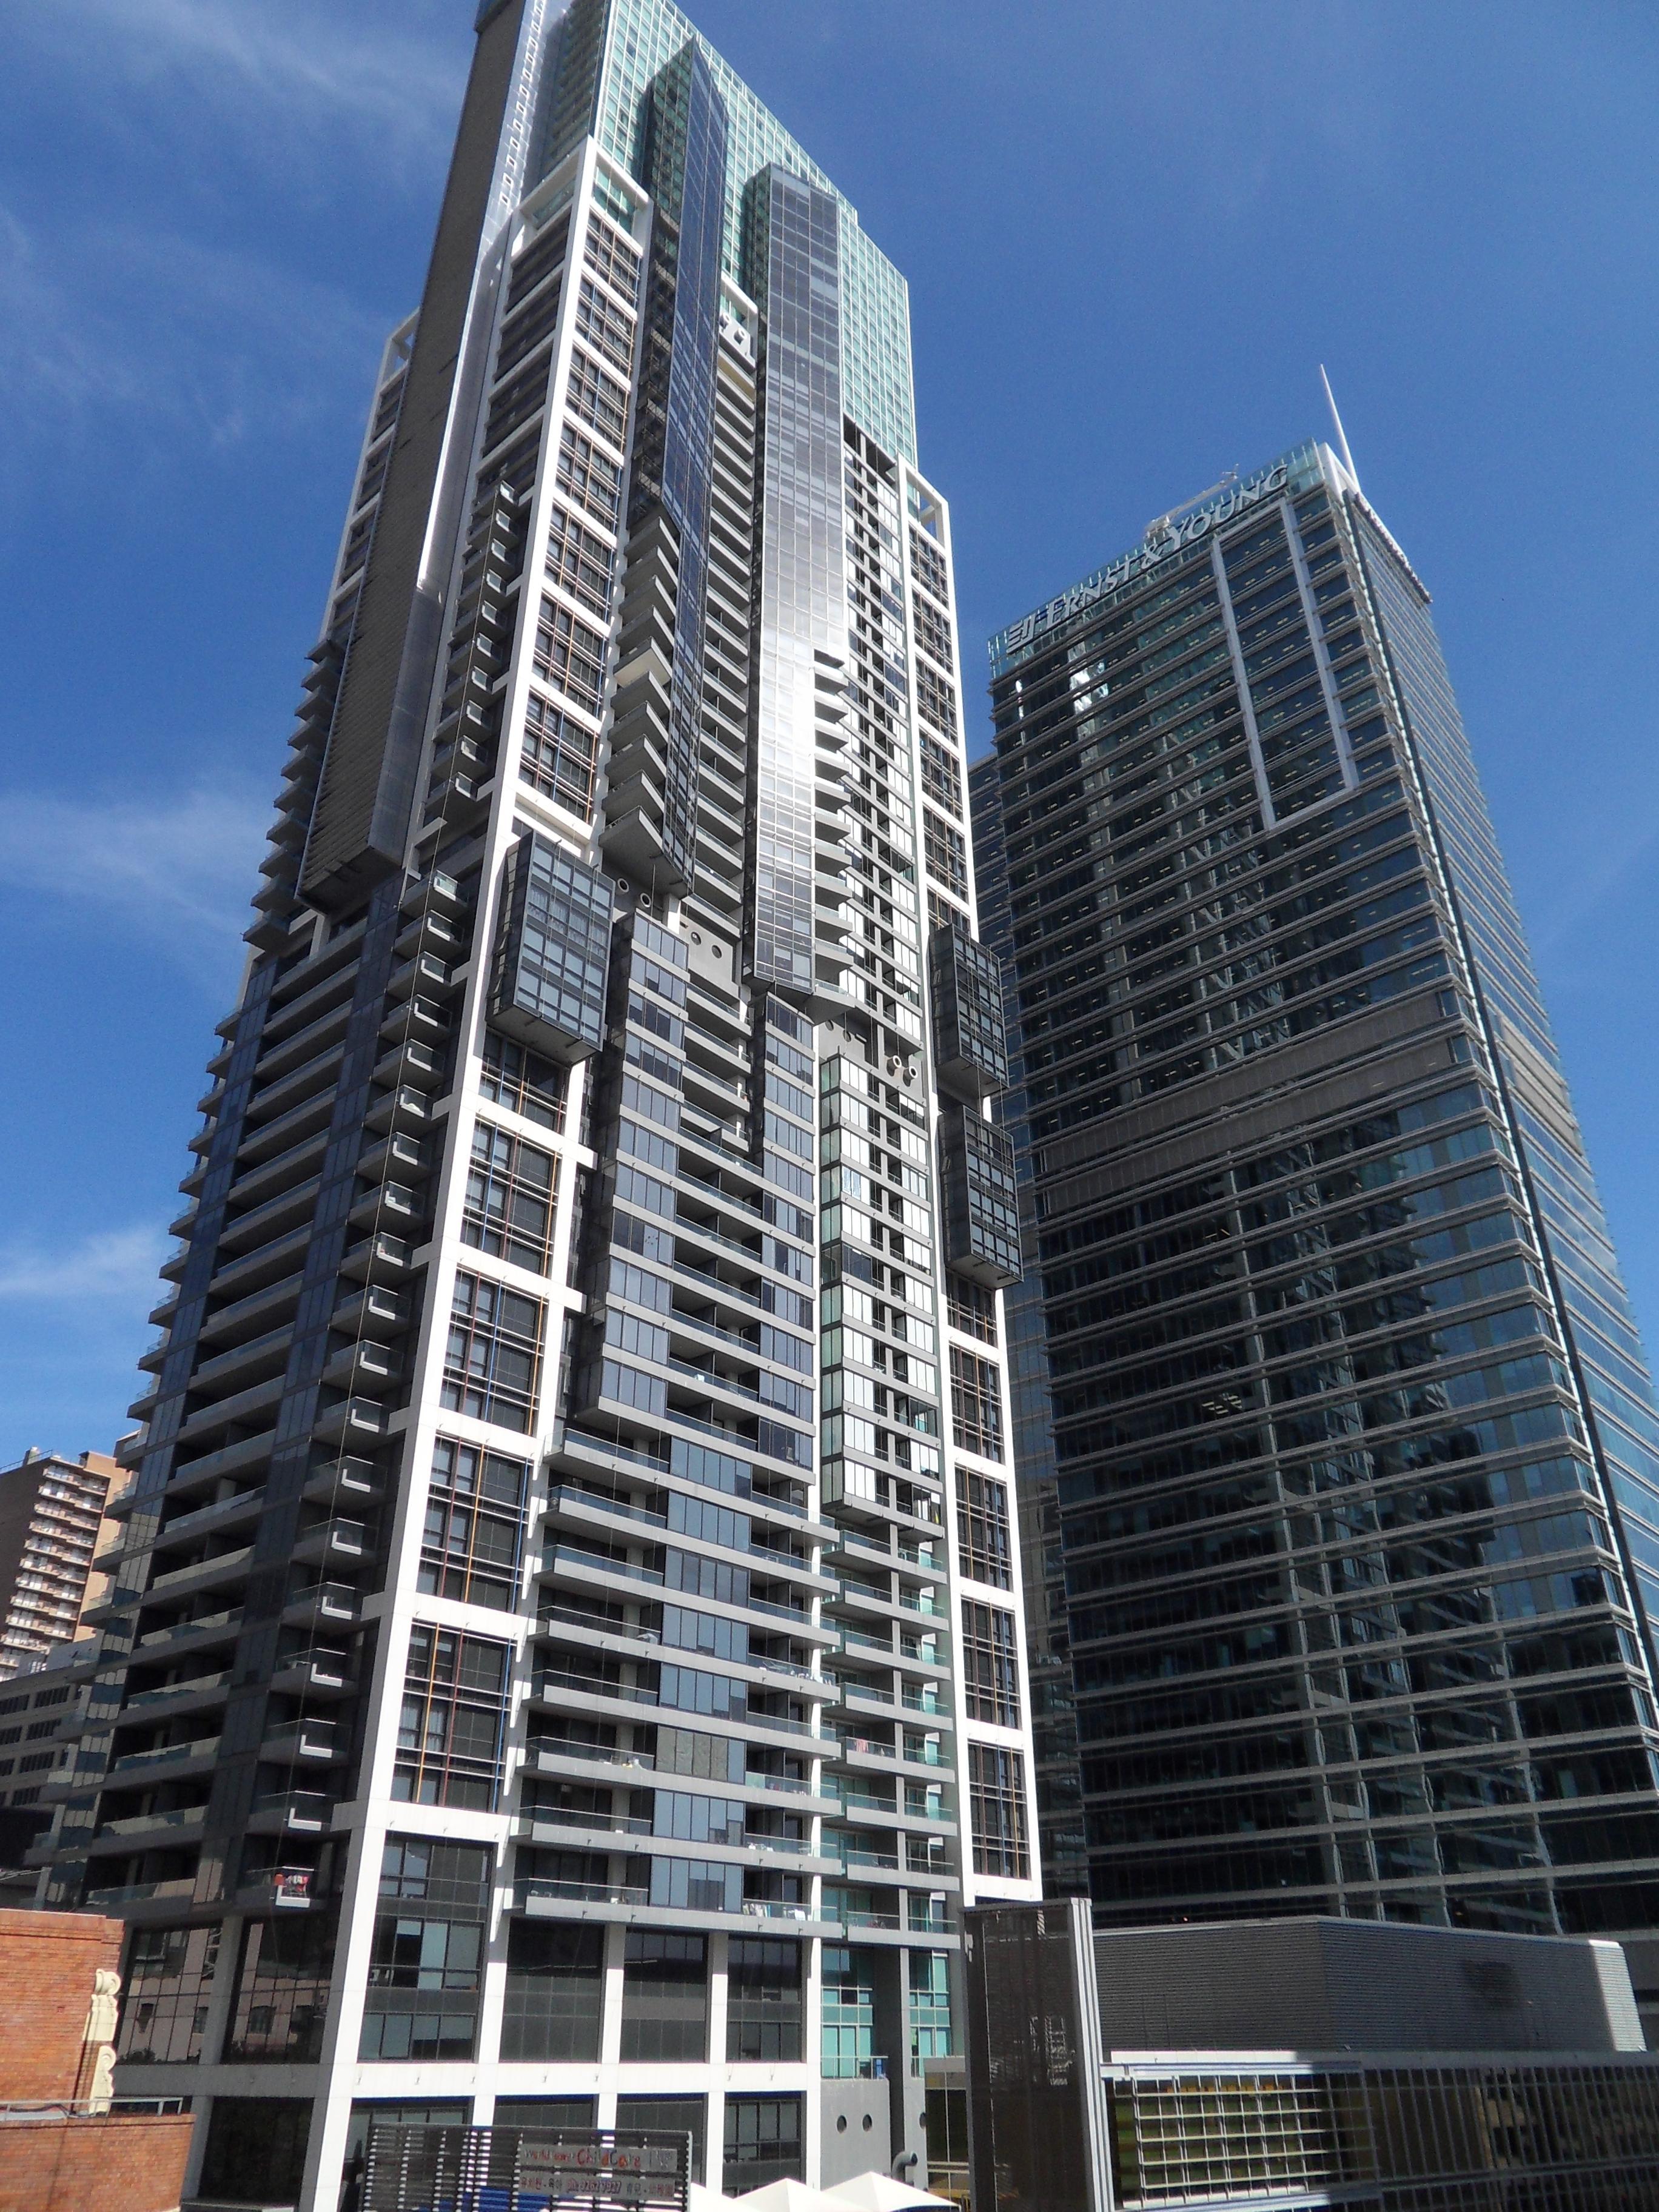 FileWorld Tower Sydney Australiajpg  Wikimedia Commons